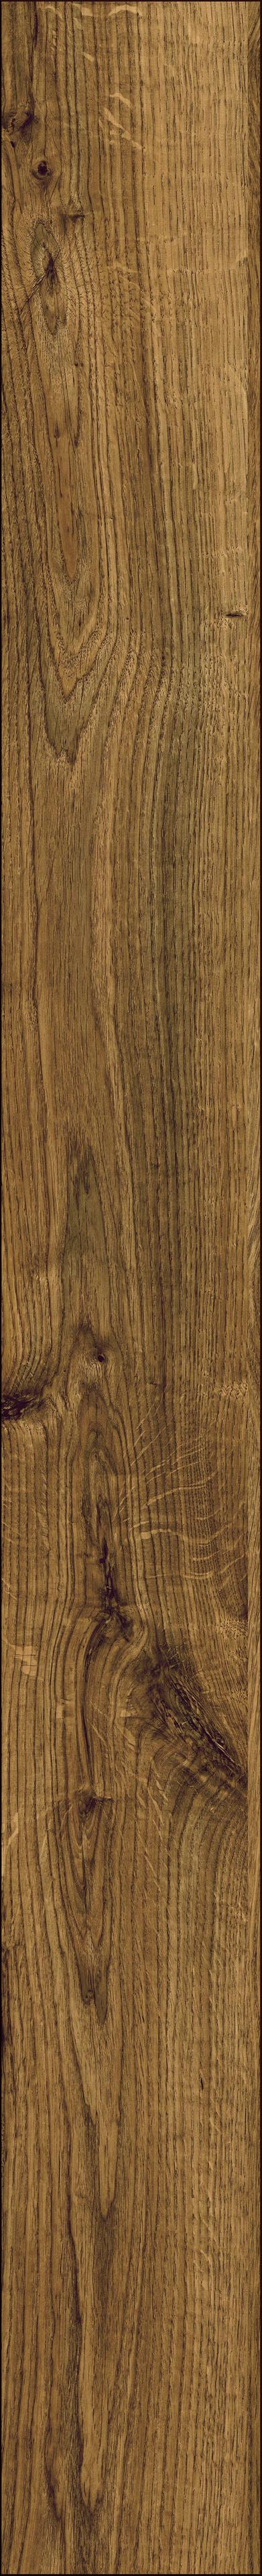 kronotex mammut everest oak bronze d 3077 from kronotex. Black Bedroom Furniture Sets. Home Design Ideas